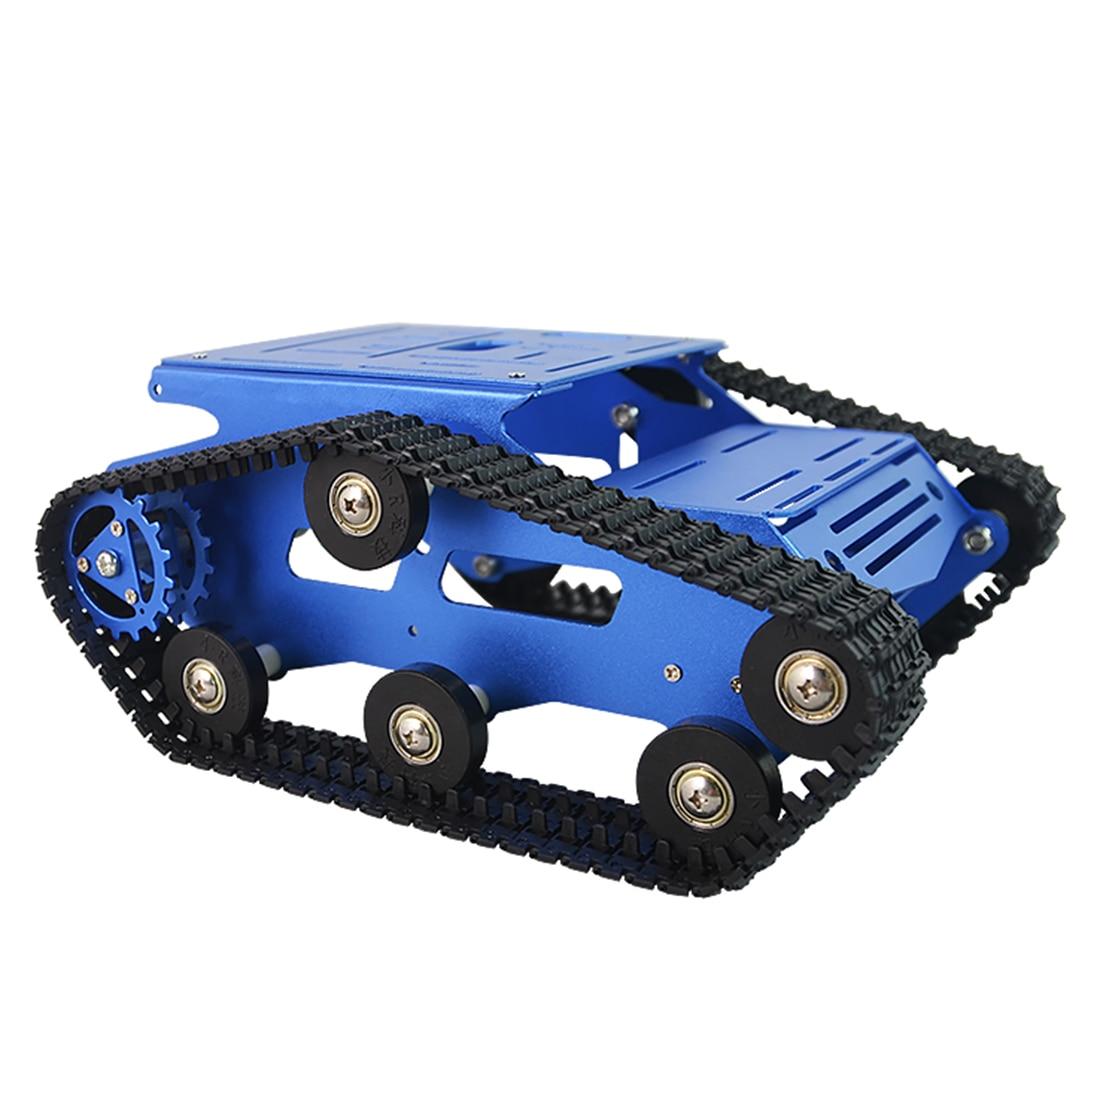 MODIKER DIY High Tech Smart Robot Tank Crawler Chassis Car Frame Kit Programmable Toys Age 8+ Kids Christmas Gift - Blue